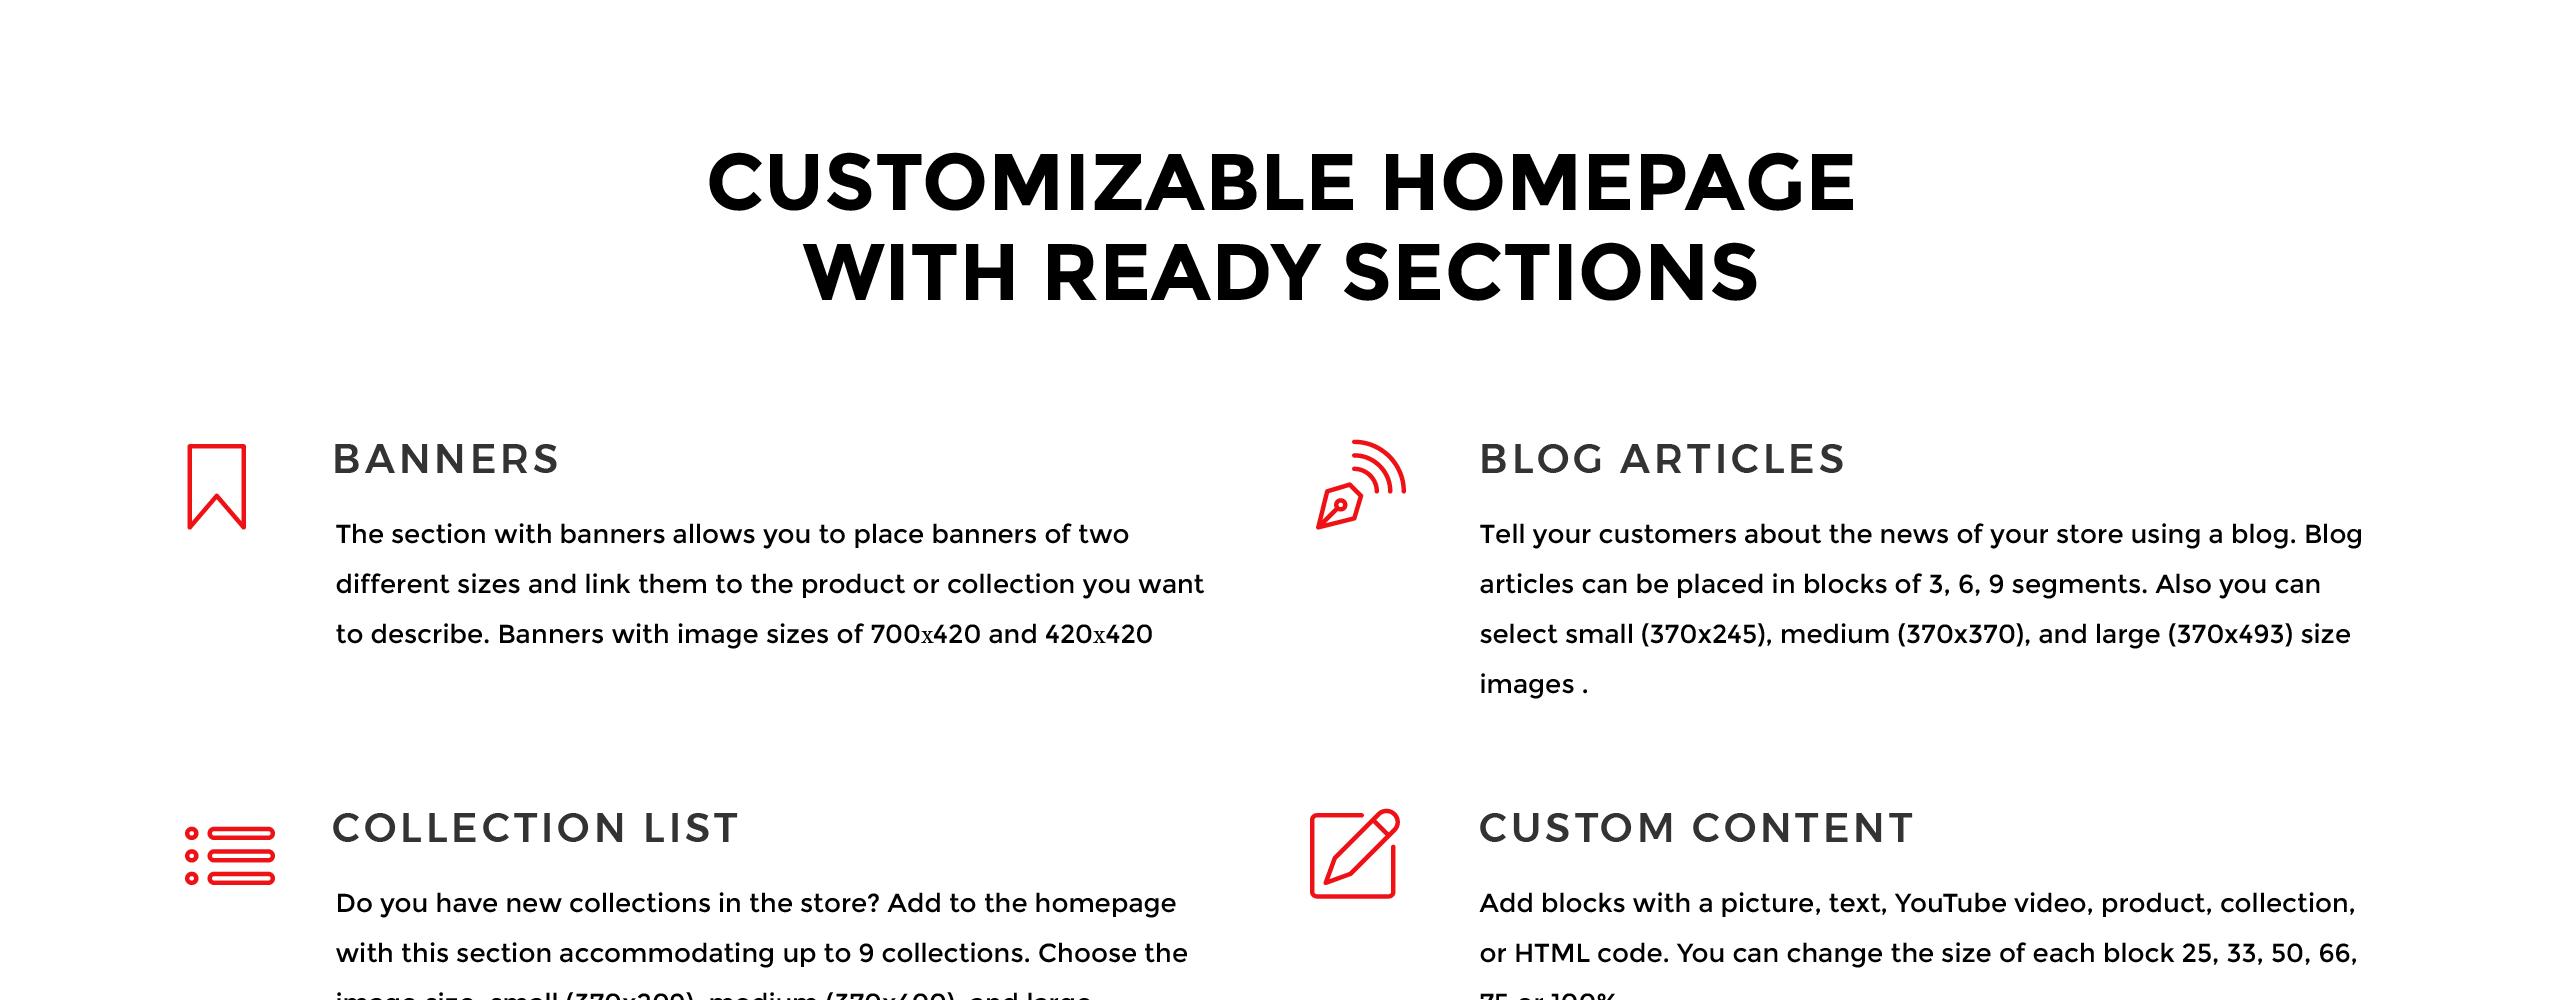 Website Design Template 74540 - shop shopify store wholesaleundefined